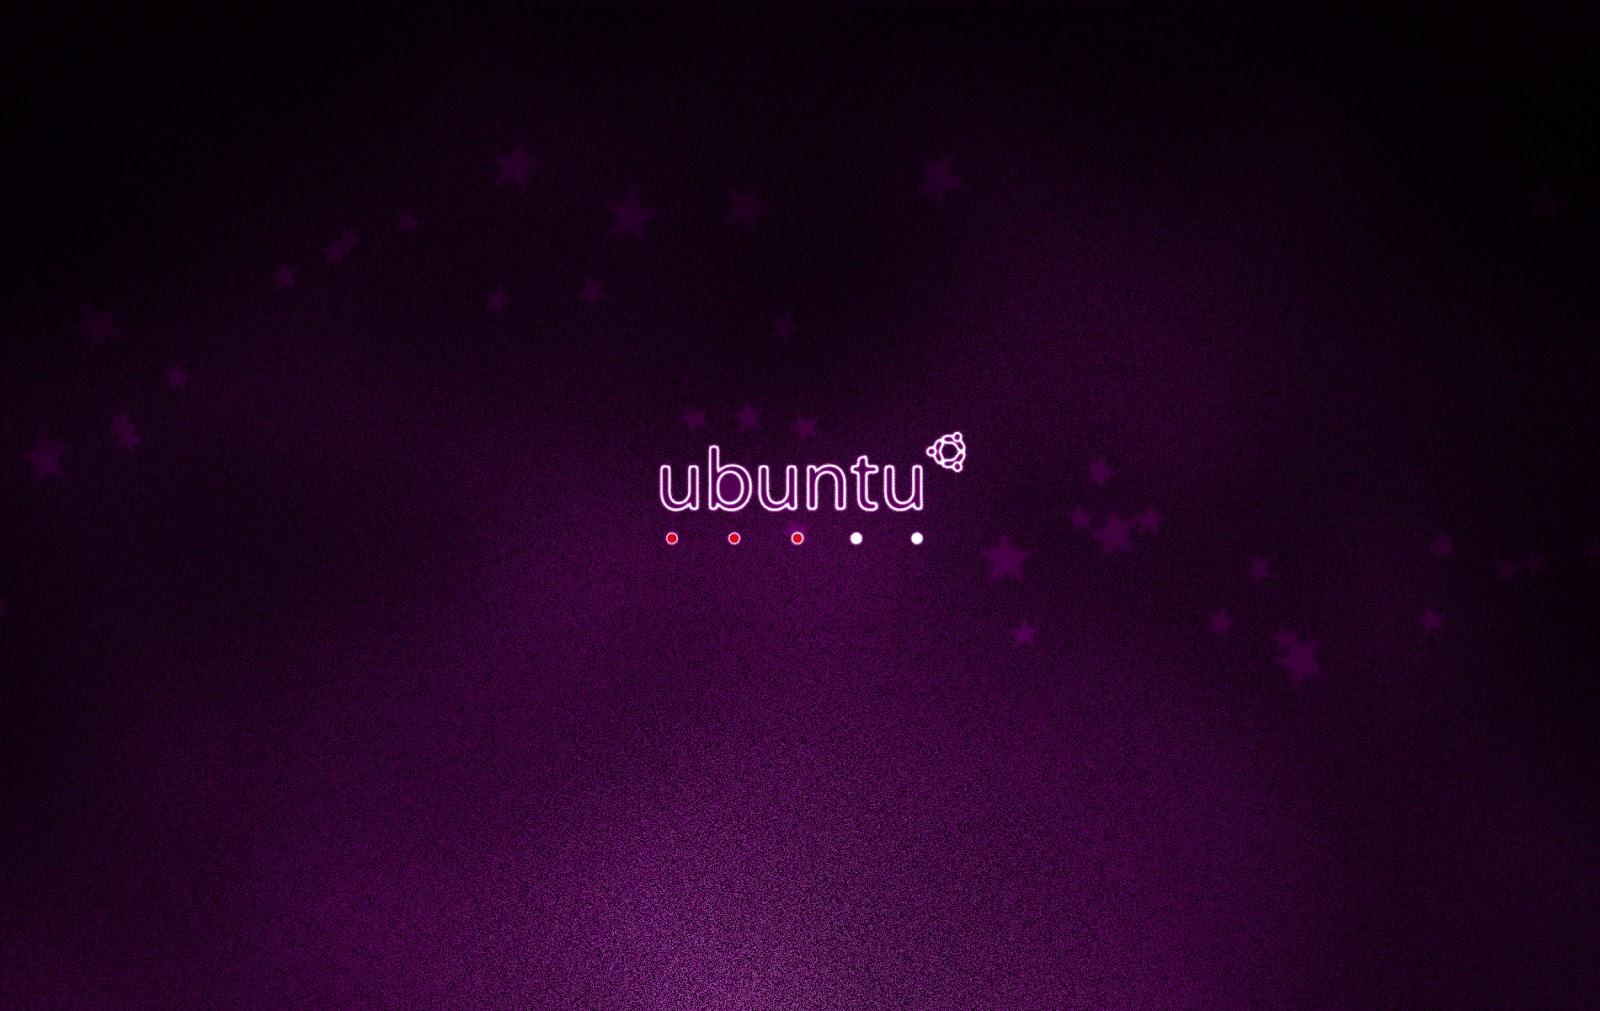 ubuntu hd wallpapers ubuntu hd wallpapers ubuntu hd wallpapers ubuntu 1600x1011